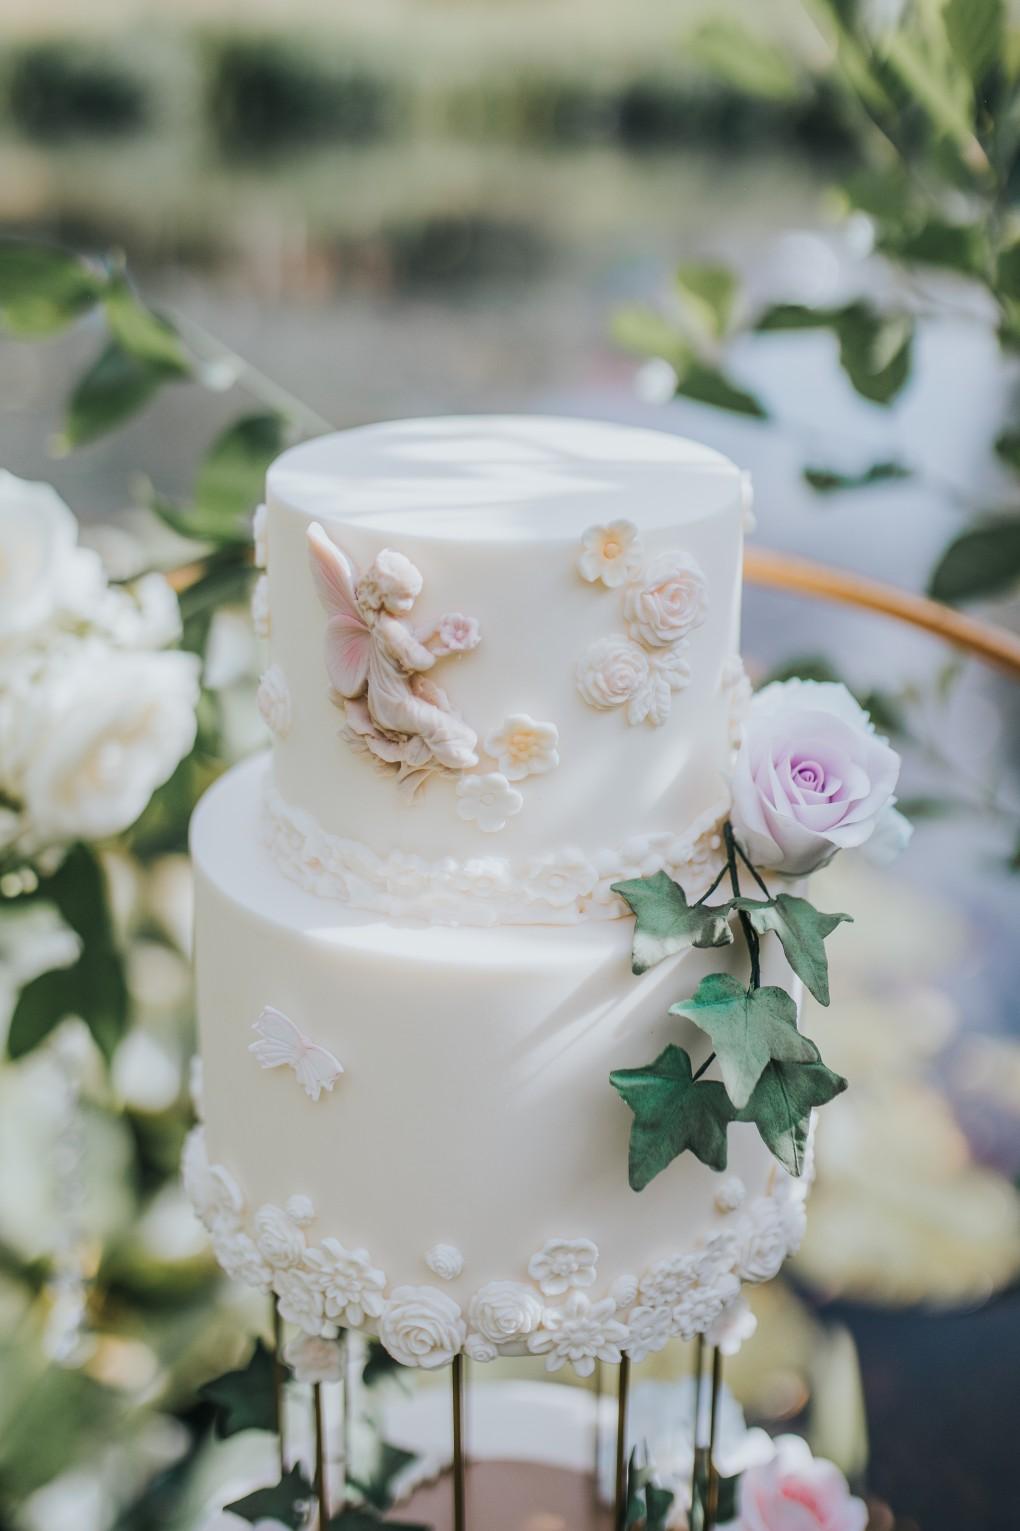 fairy wedding - whimsical wedding - magical wedding - elegant wedding dress - fairytale wedding cake - unique wedding cake - ethereal wedding cake